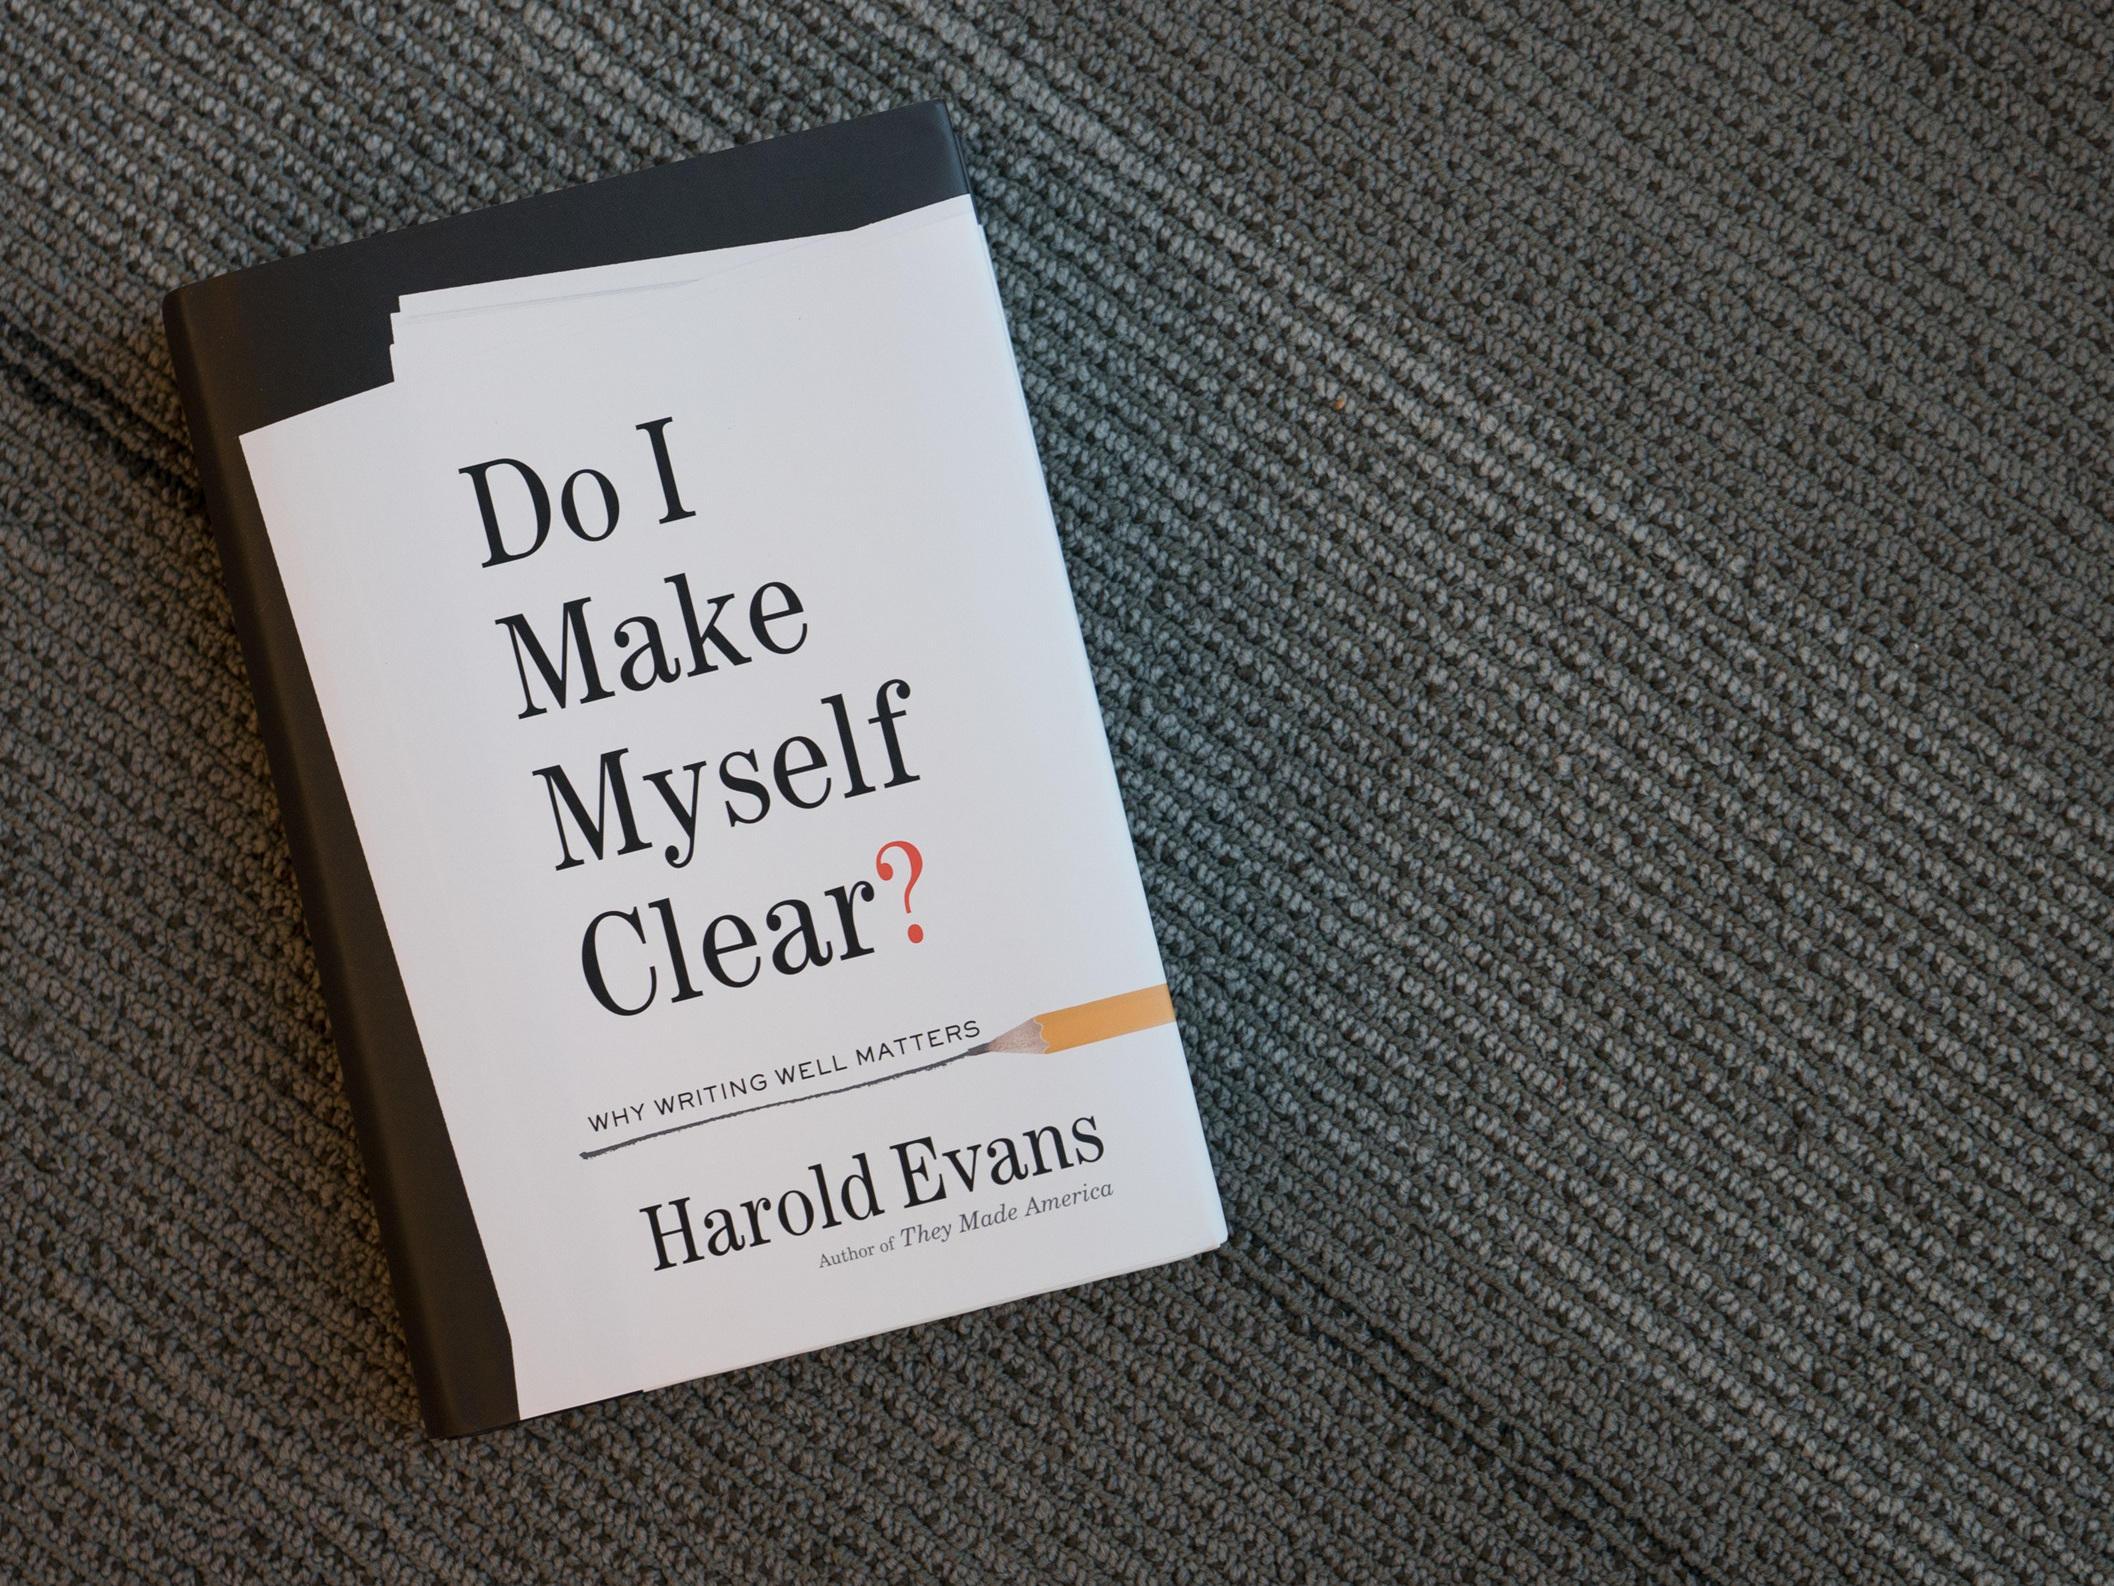 Harold Evans Makes Himself Clear: No More Passive Voice | WPSU